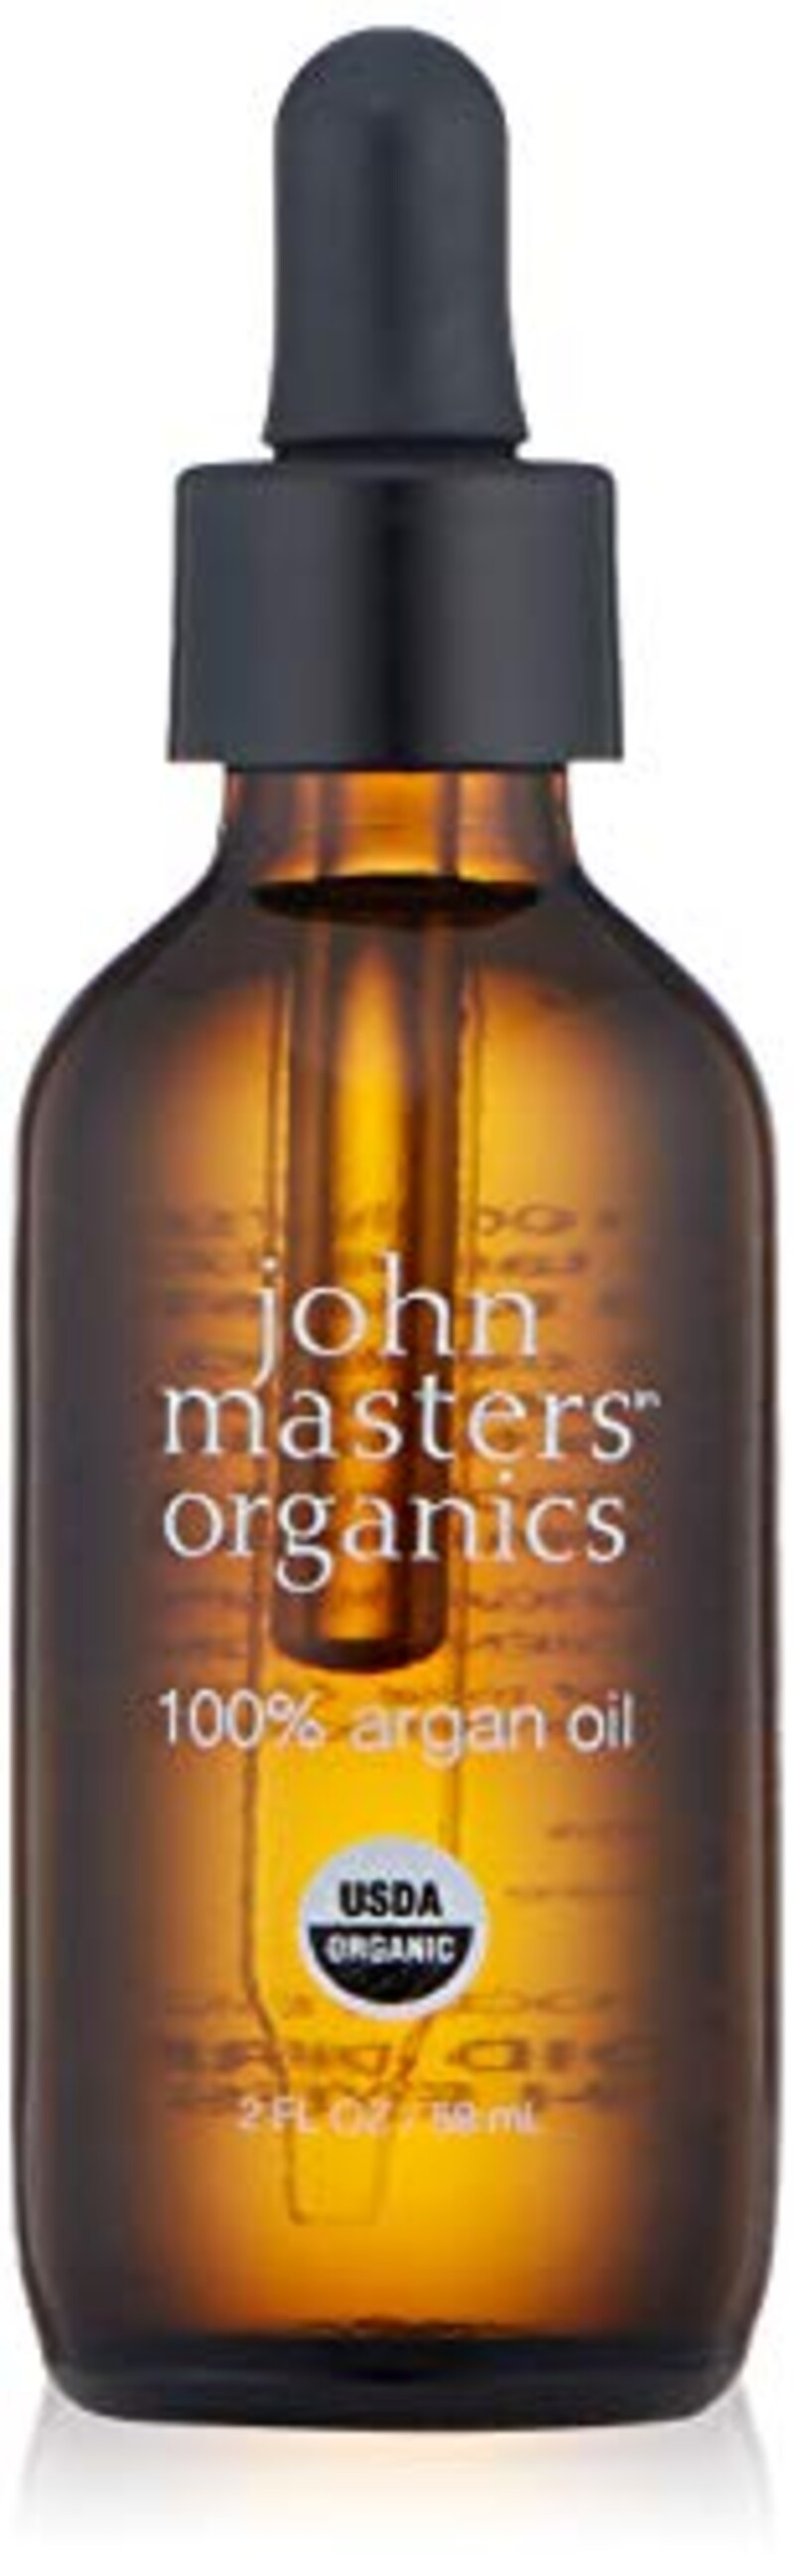 john masters organics(ジョンマスターオーガニック),ARオイルN,AON